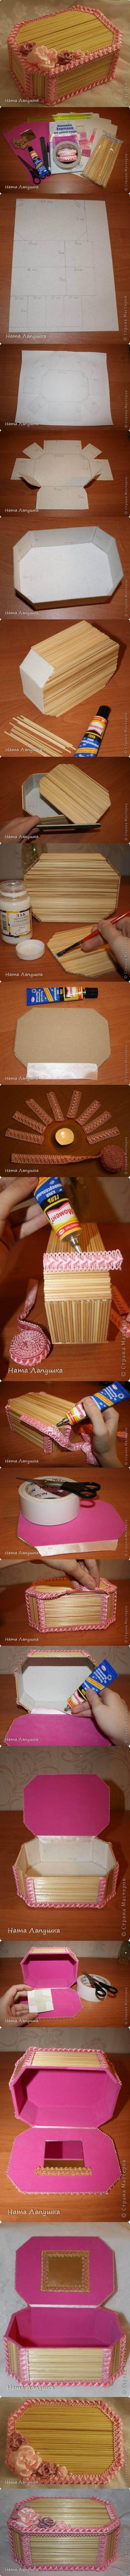 Caja con palillos!   Manualidades Gratis